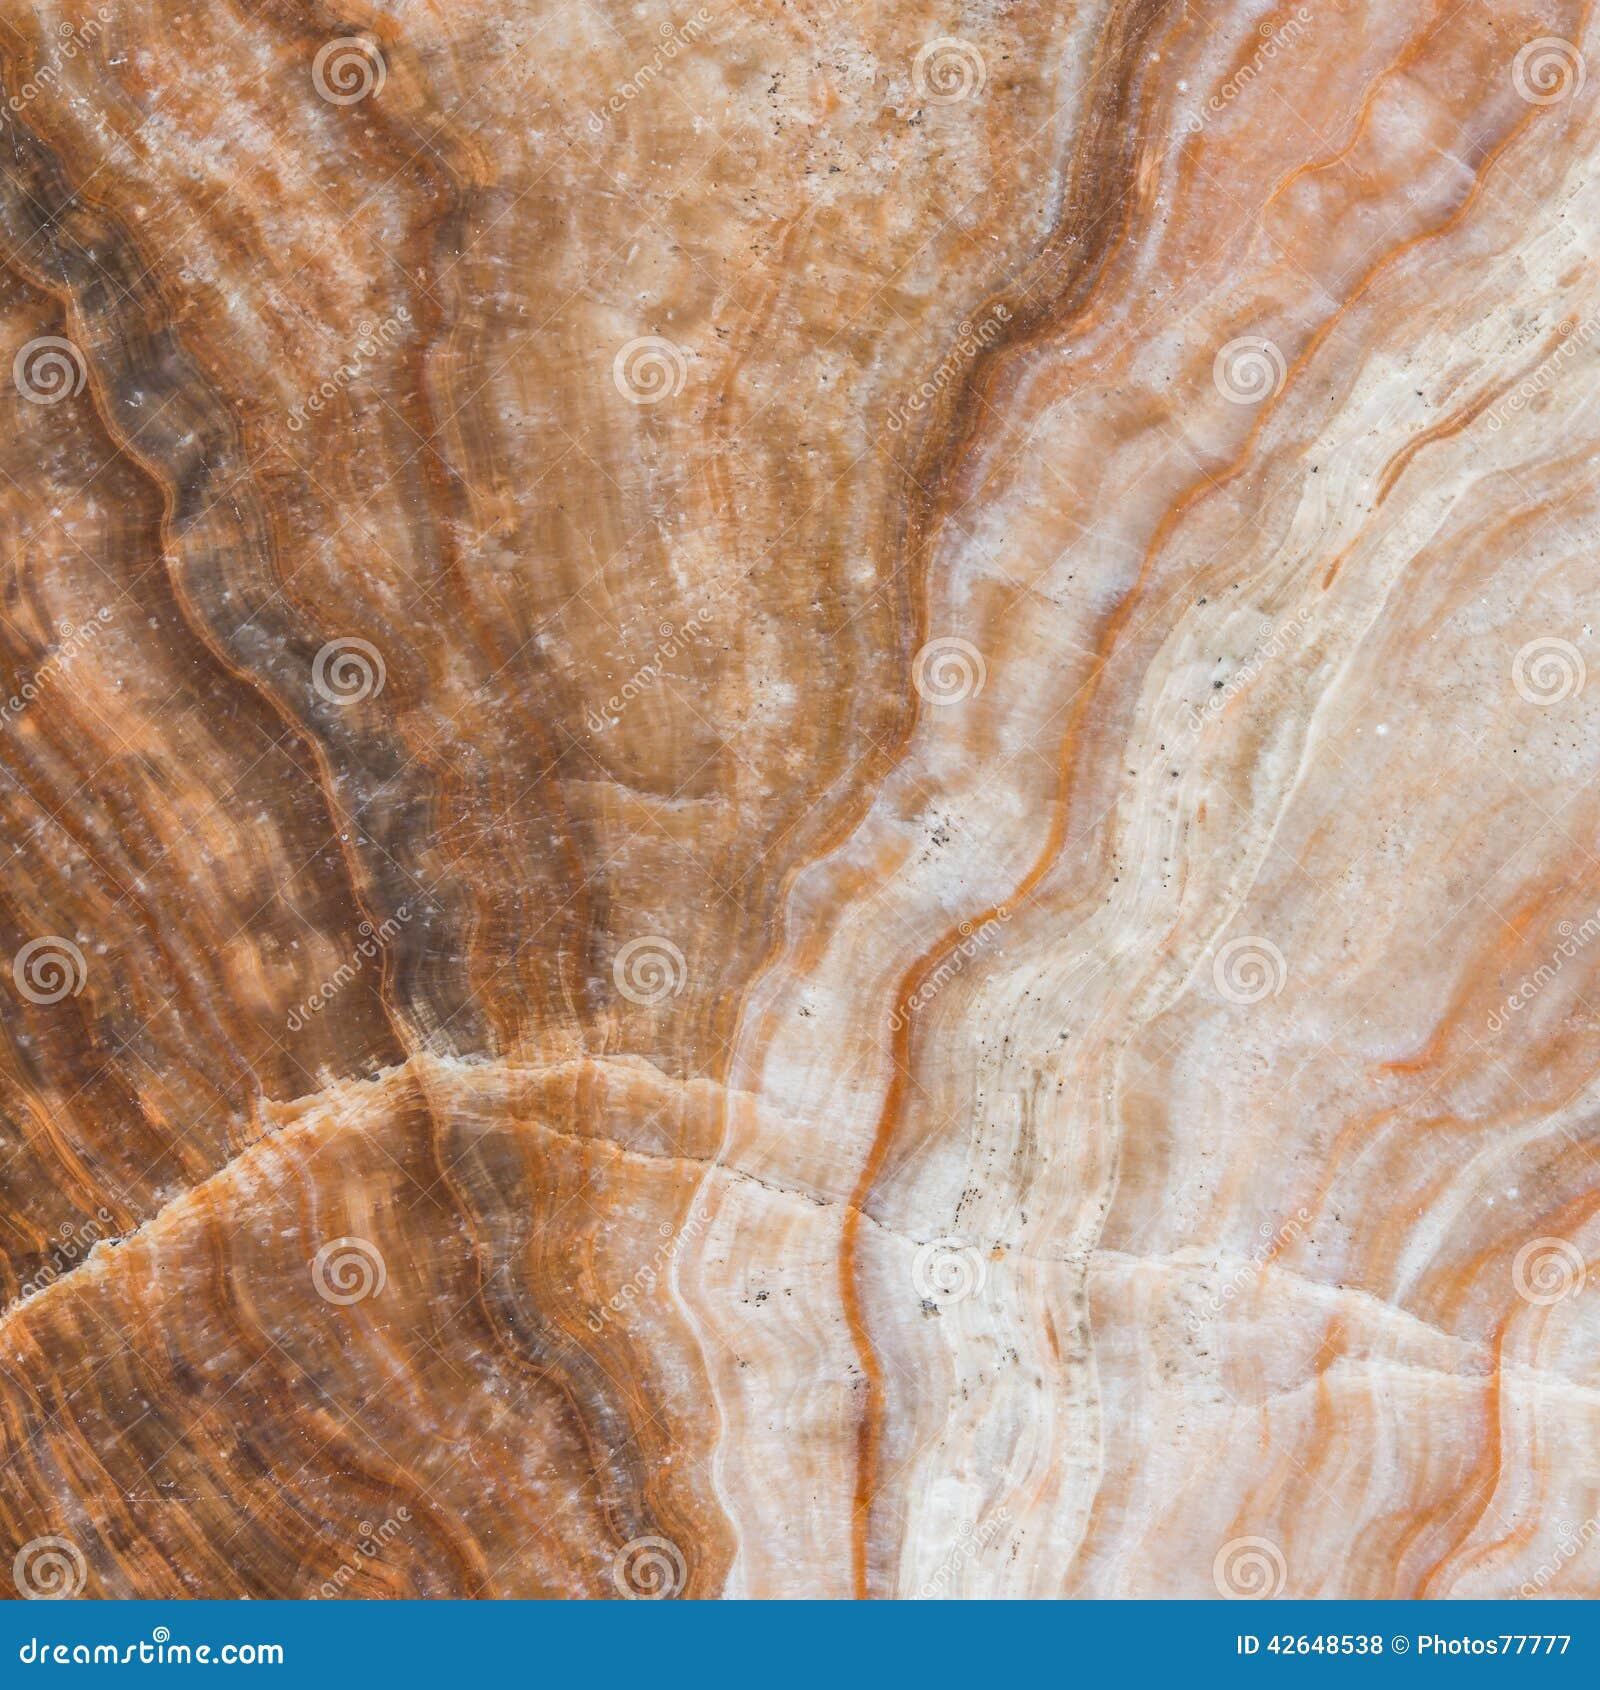 Textura del piso de m rmol foto de archivo imagen 42648538 for Textura del marmol